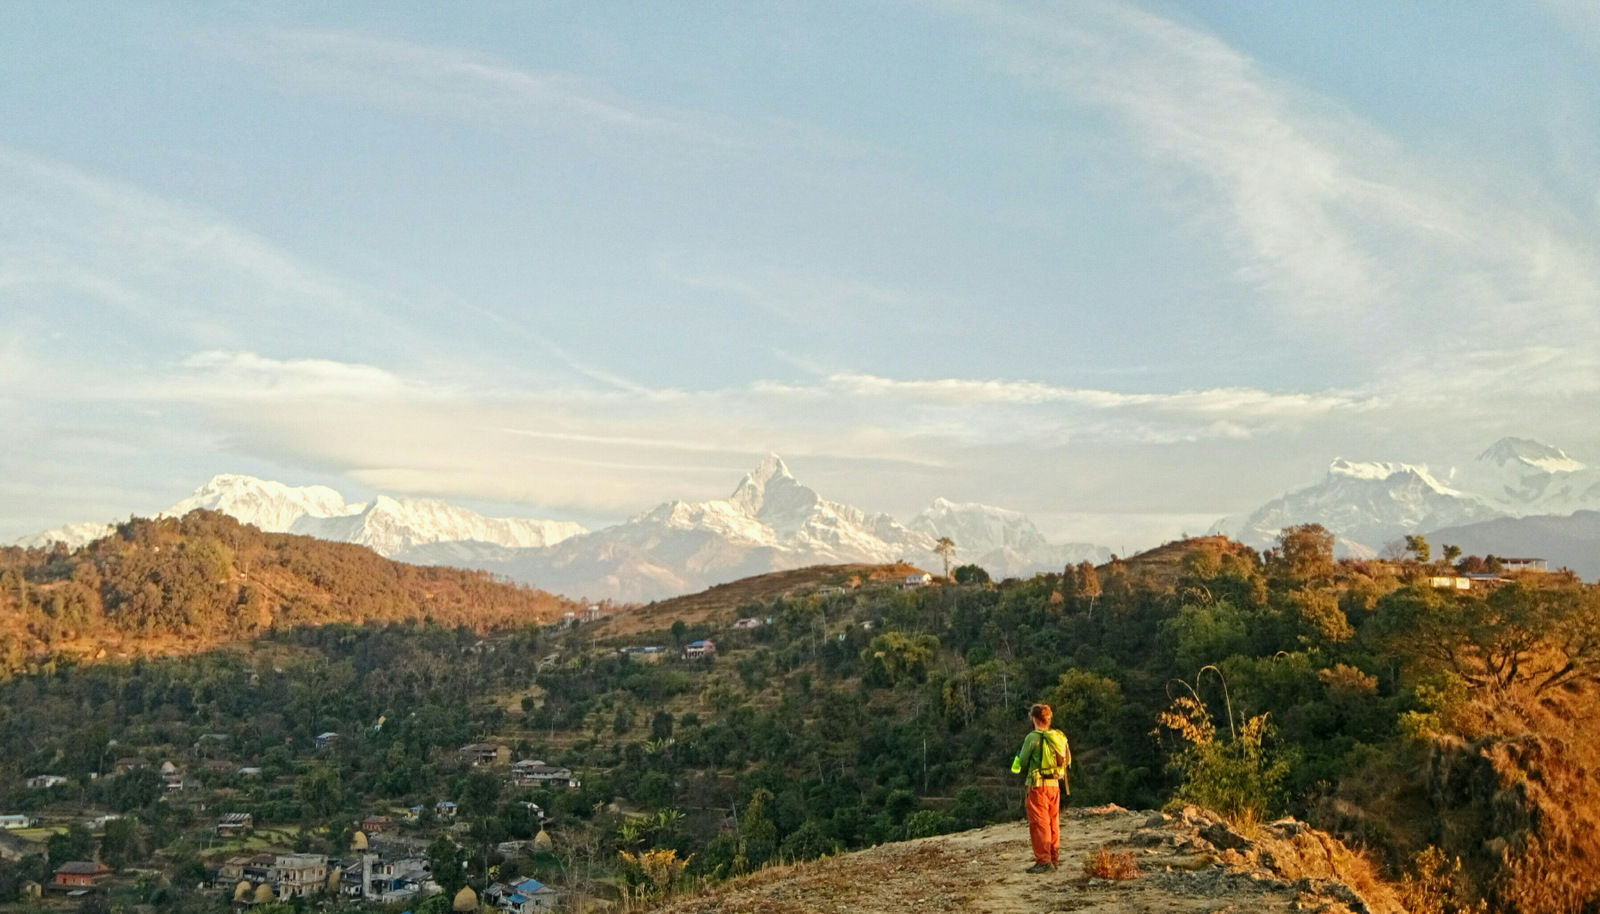 Sunrise from Methlang, Pokhara, Nepal